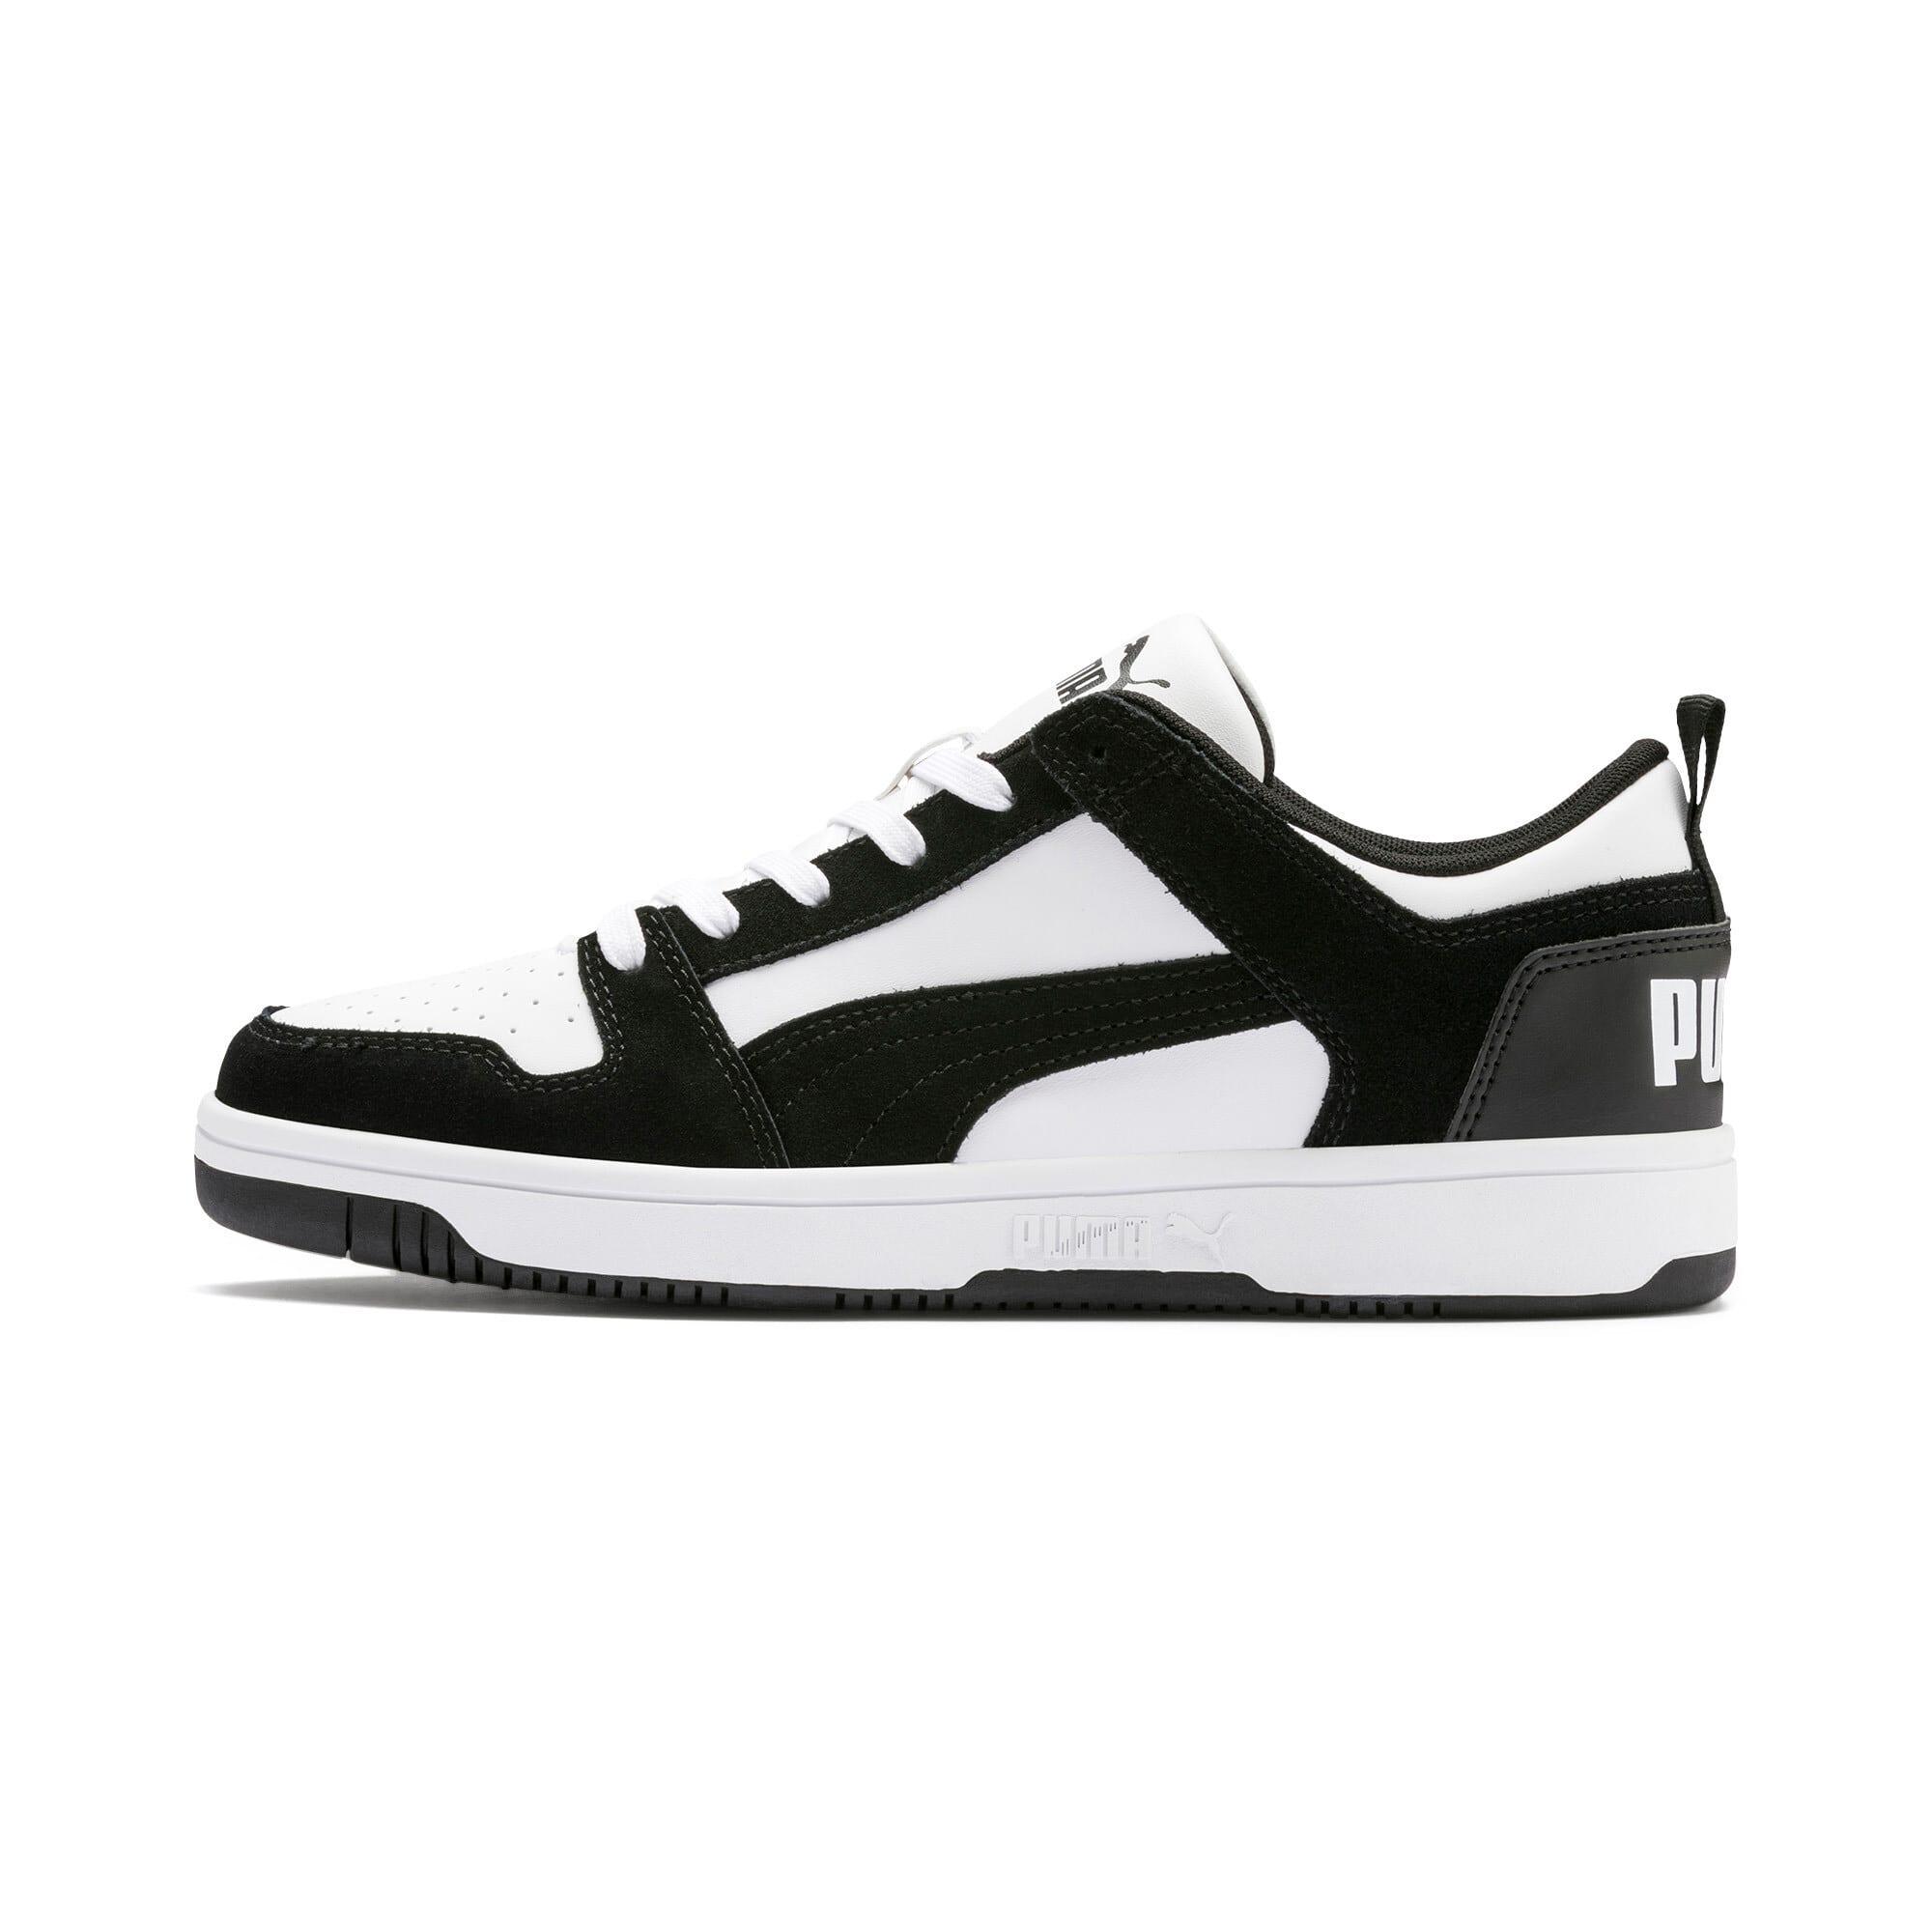 Miniatura 1 de Zapatos deportivos de gamuza PUMA Rebound LayUpLo, Puma Black-Puma White, mediano